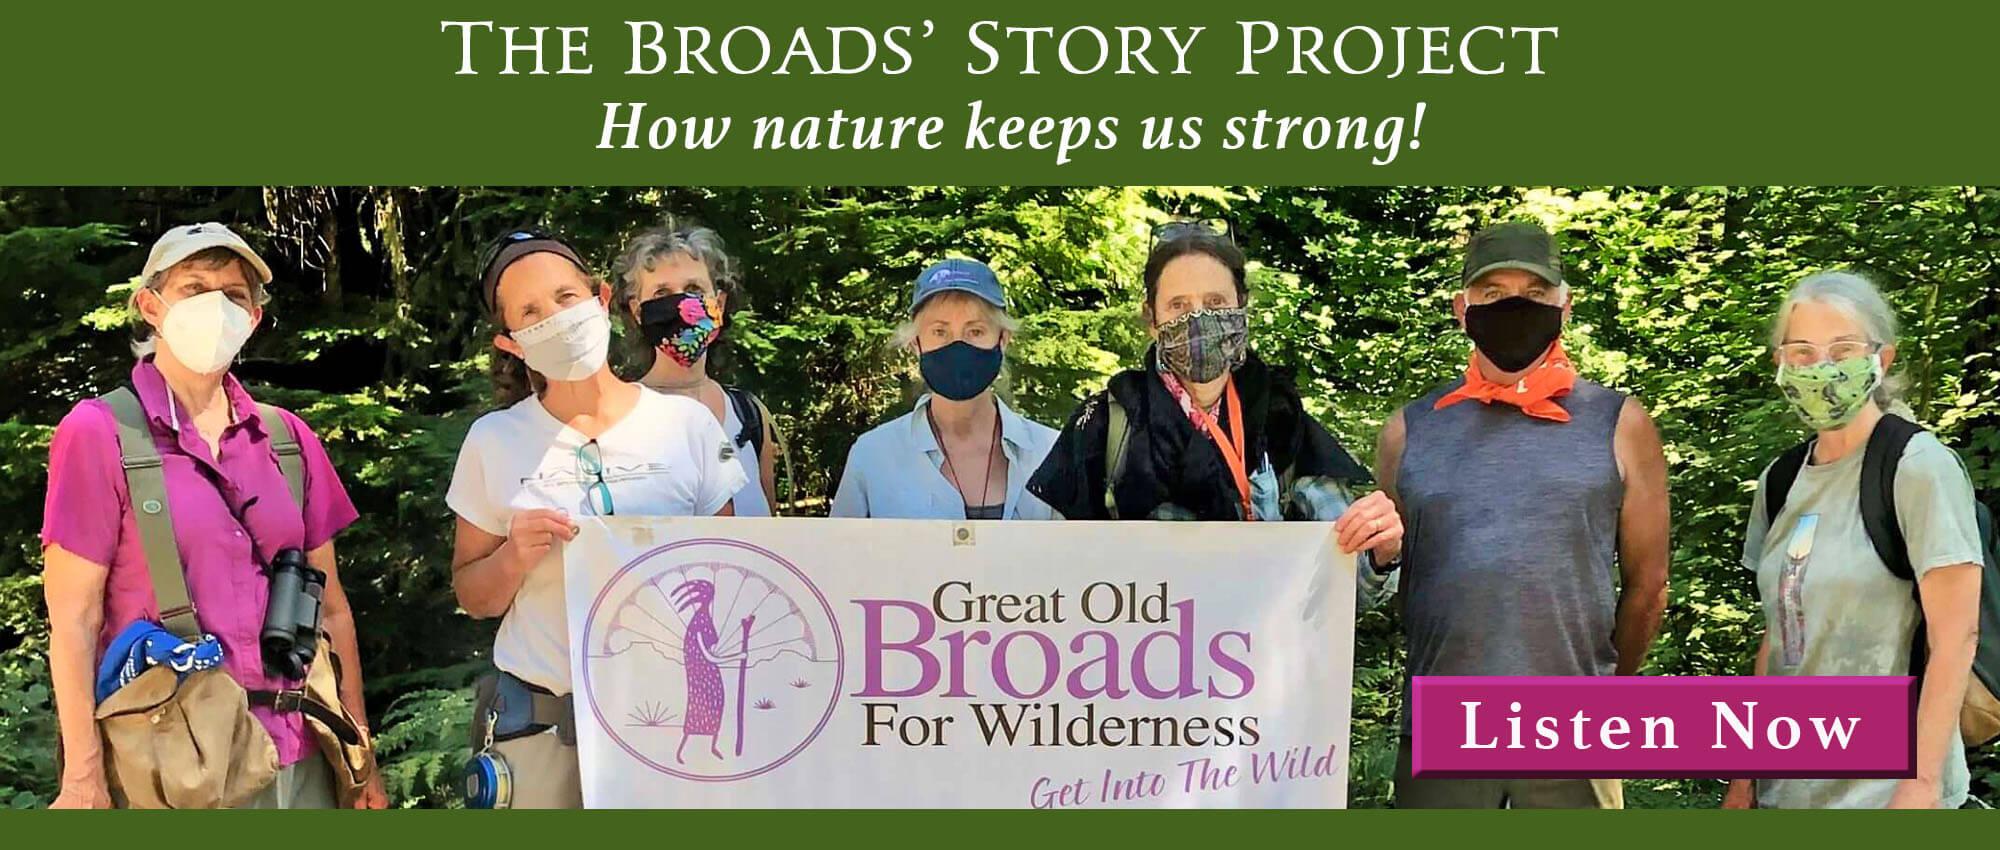 BroadsStoryProject